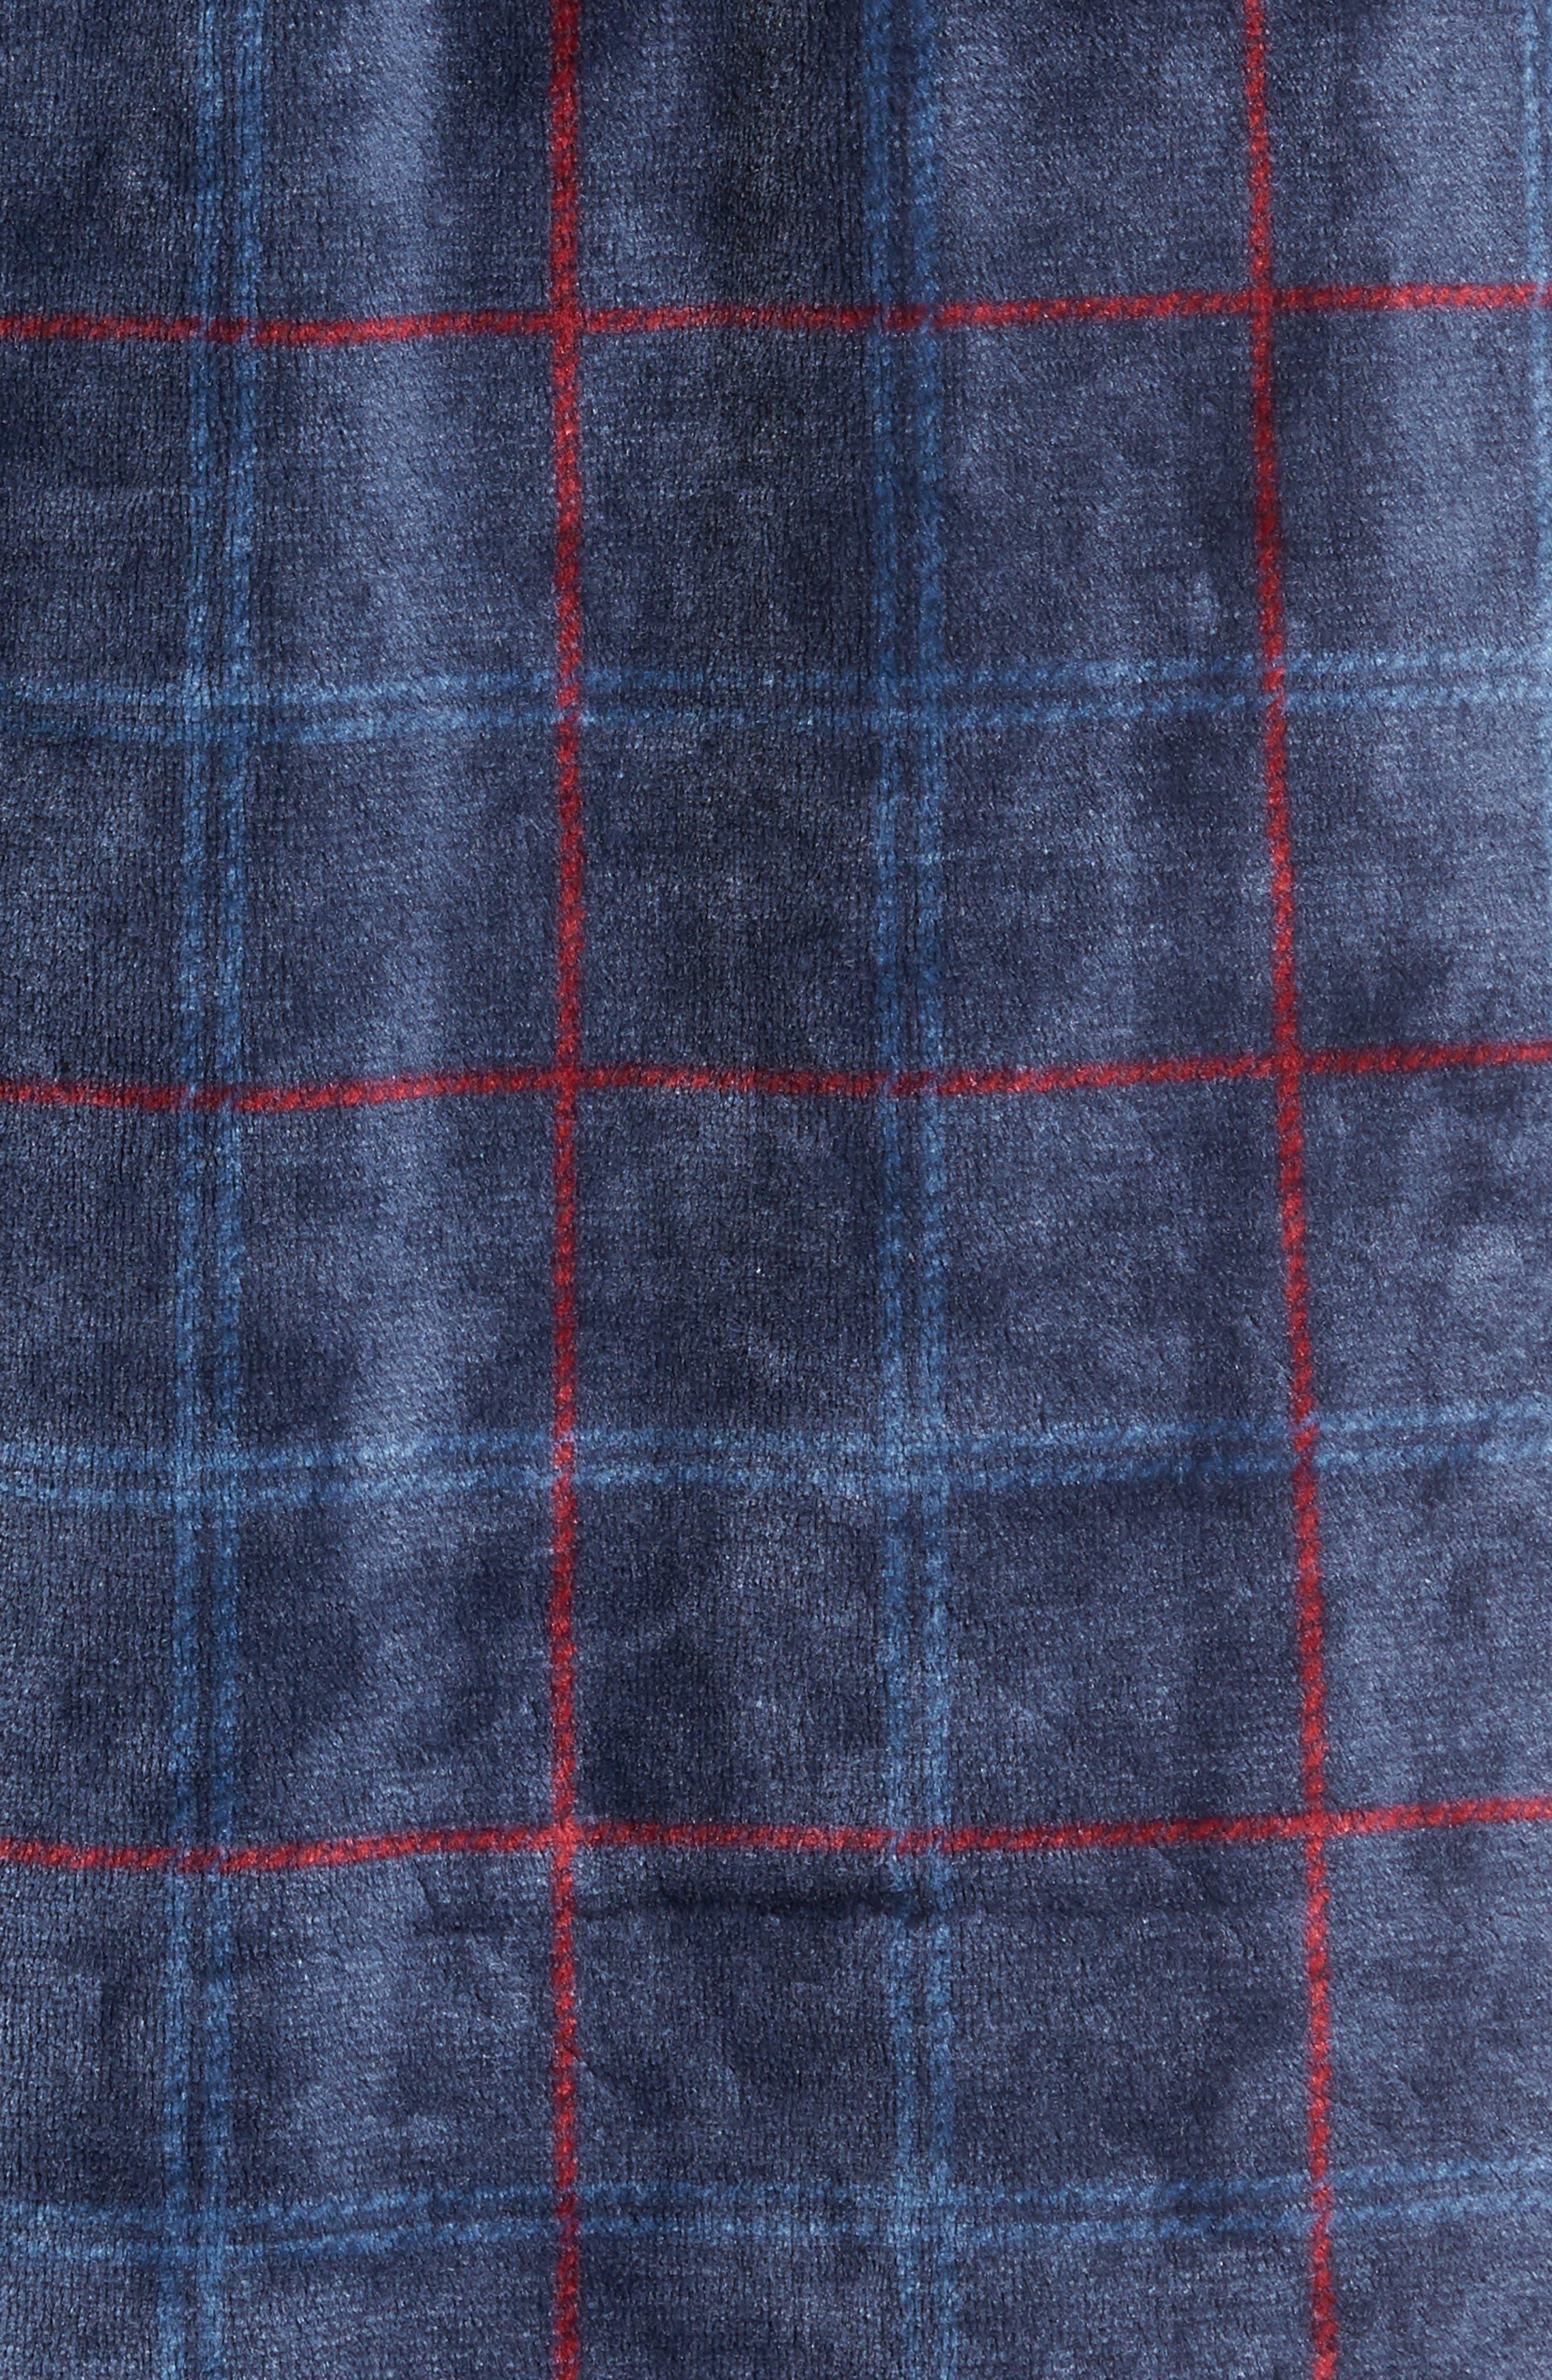 Windowpane Fleece Robe,                             Alternate thumbnail 5, color,                             NAVY -RED WINDOWPANE